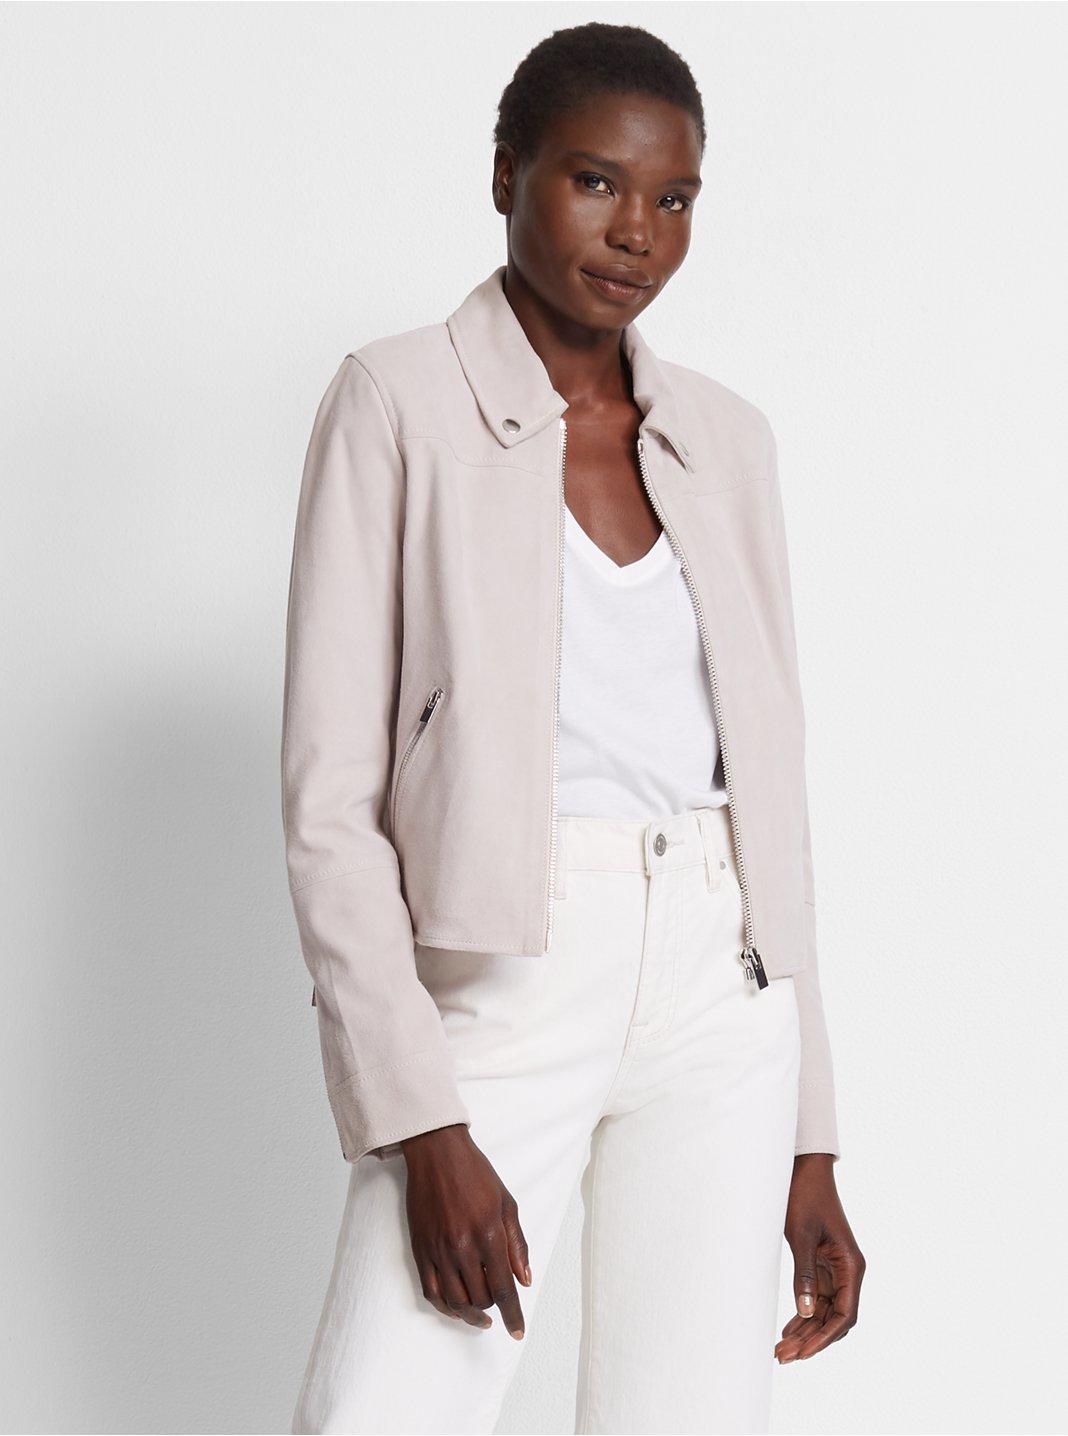 ee529d827 Women's Jackets and Vests | Club Monaco